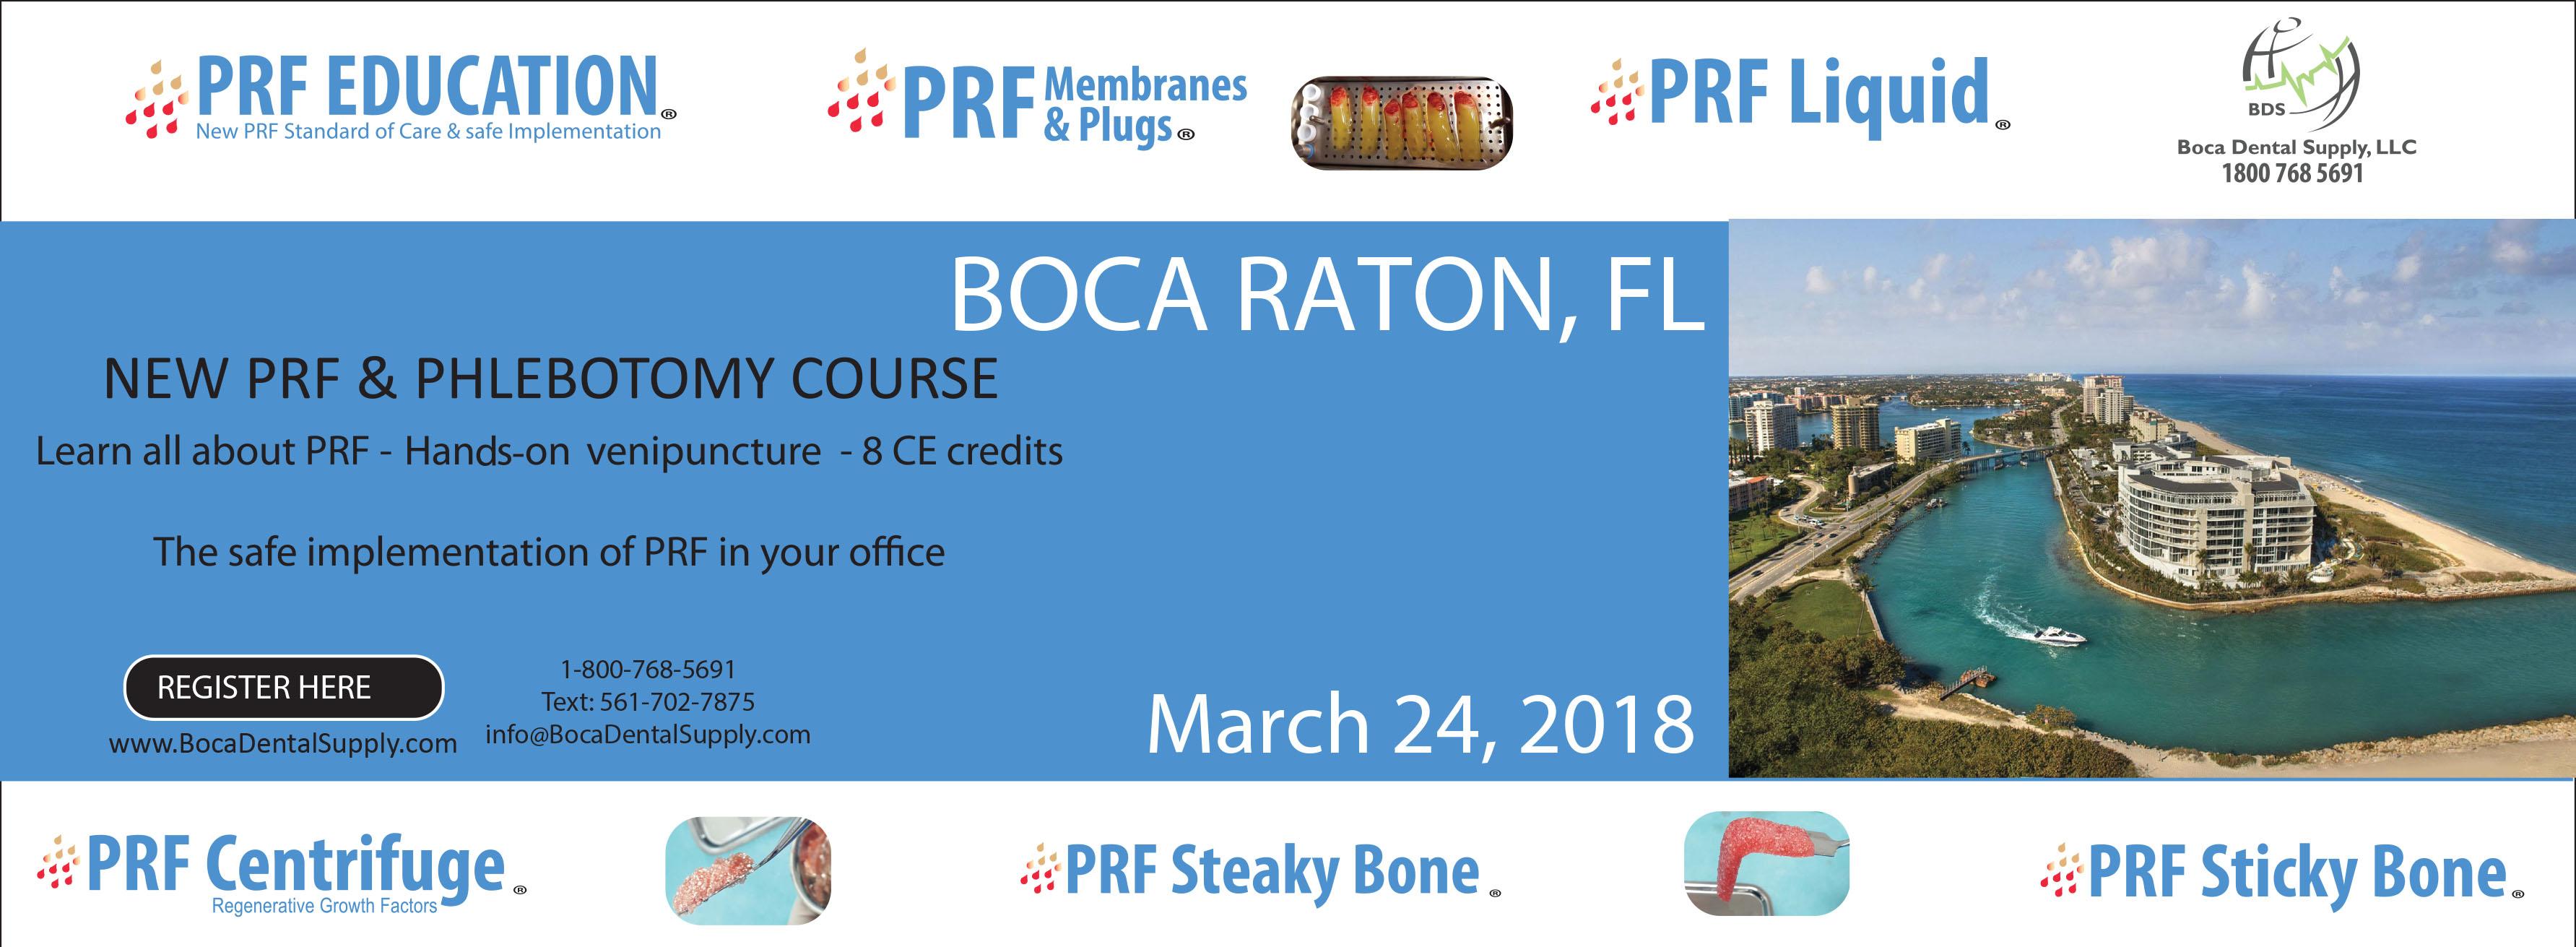 prf-course-boca-march-2018.jpg